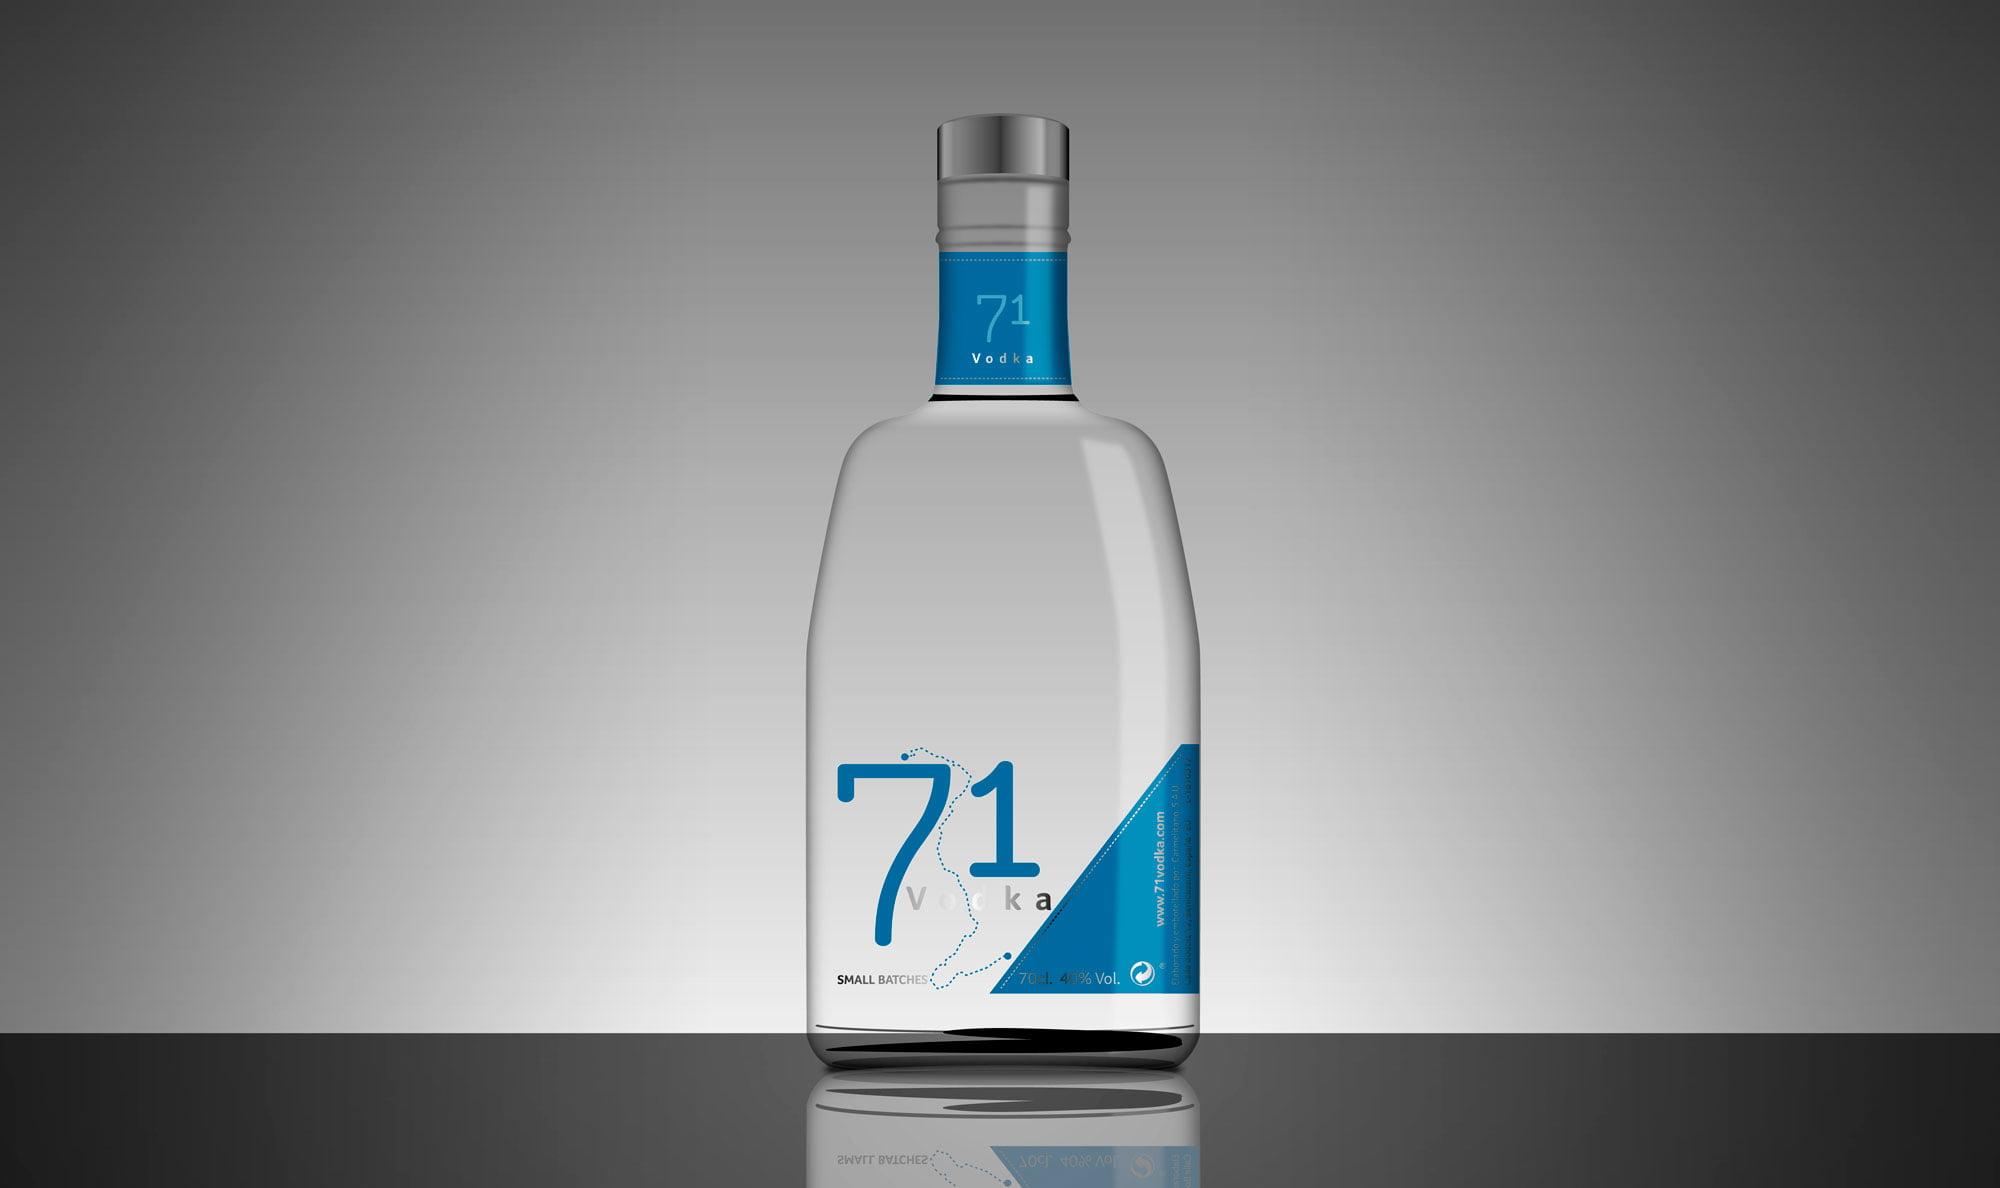 Digitus-Carmelitano-71vodka-branding-01